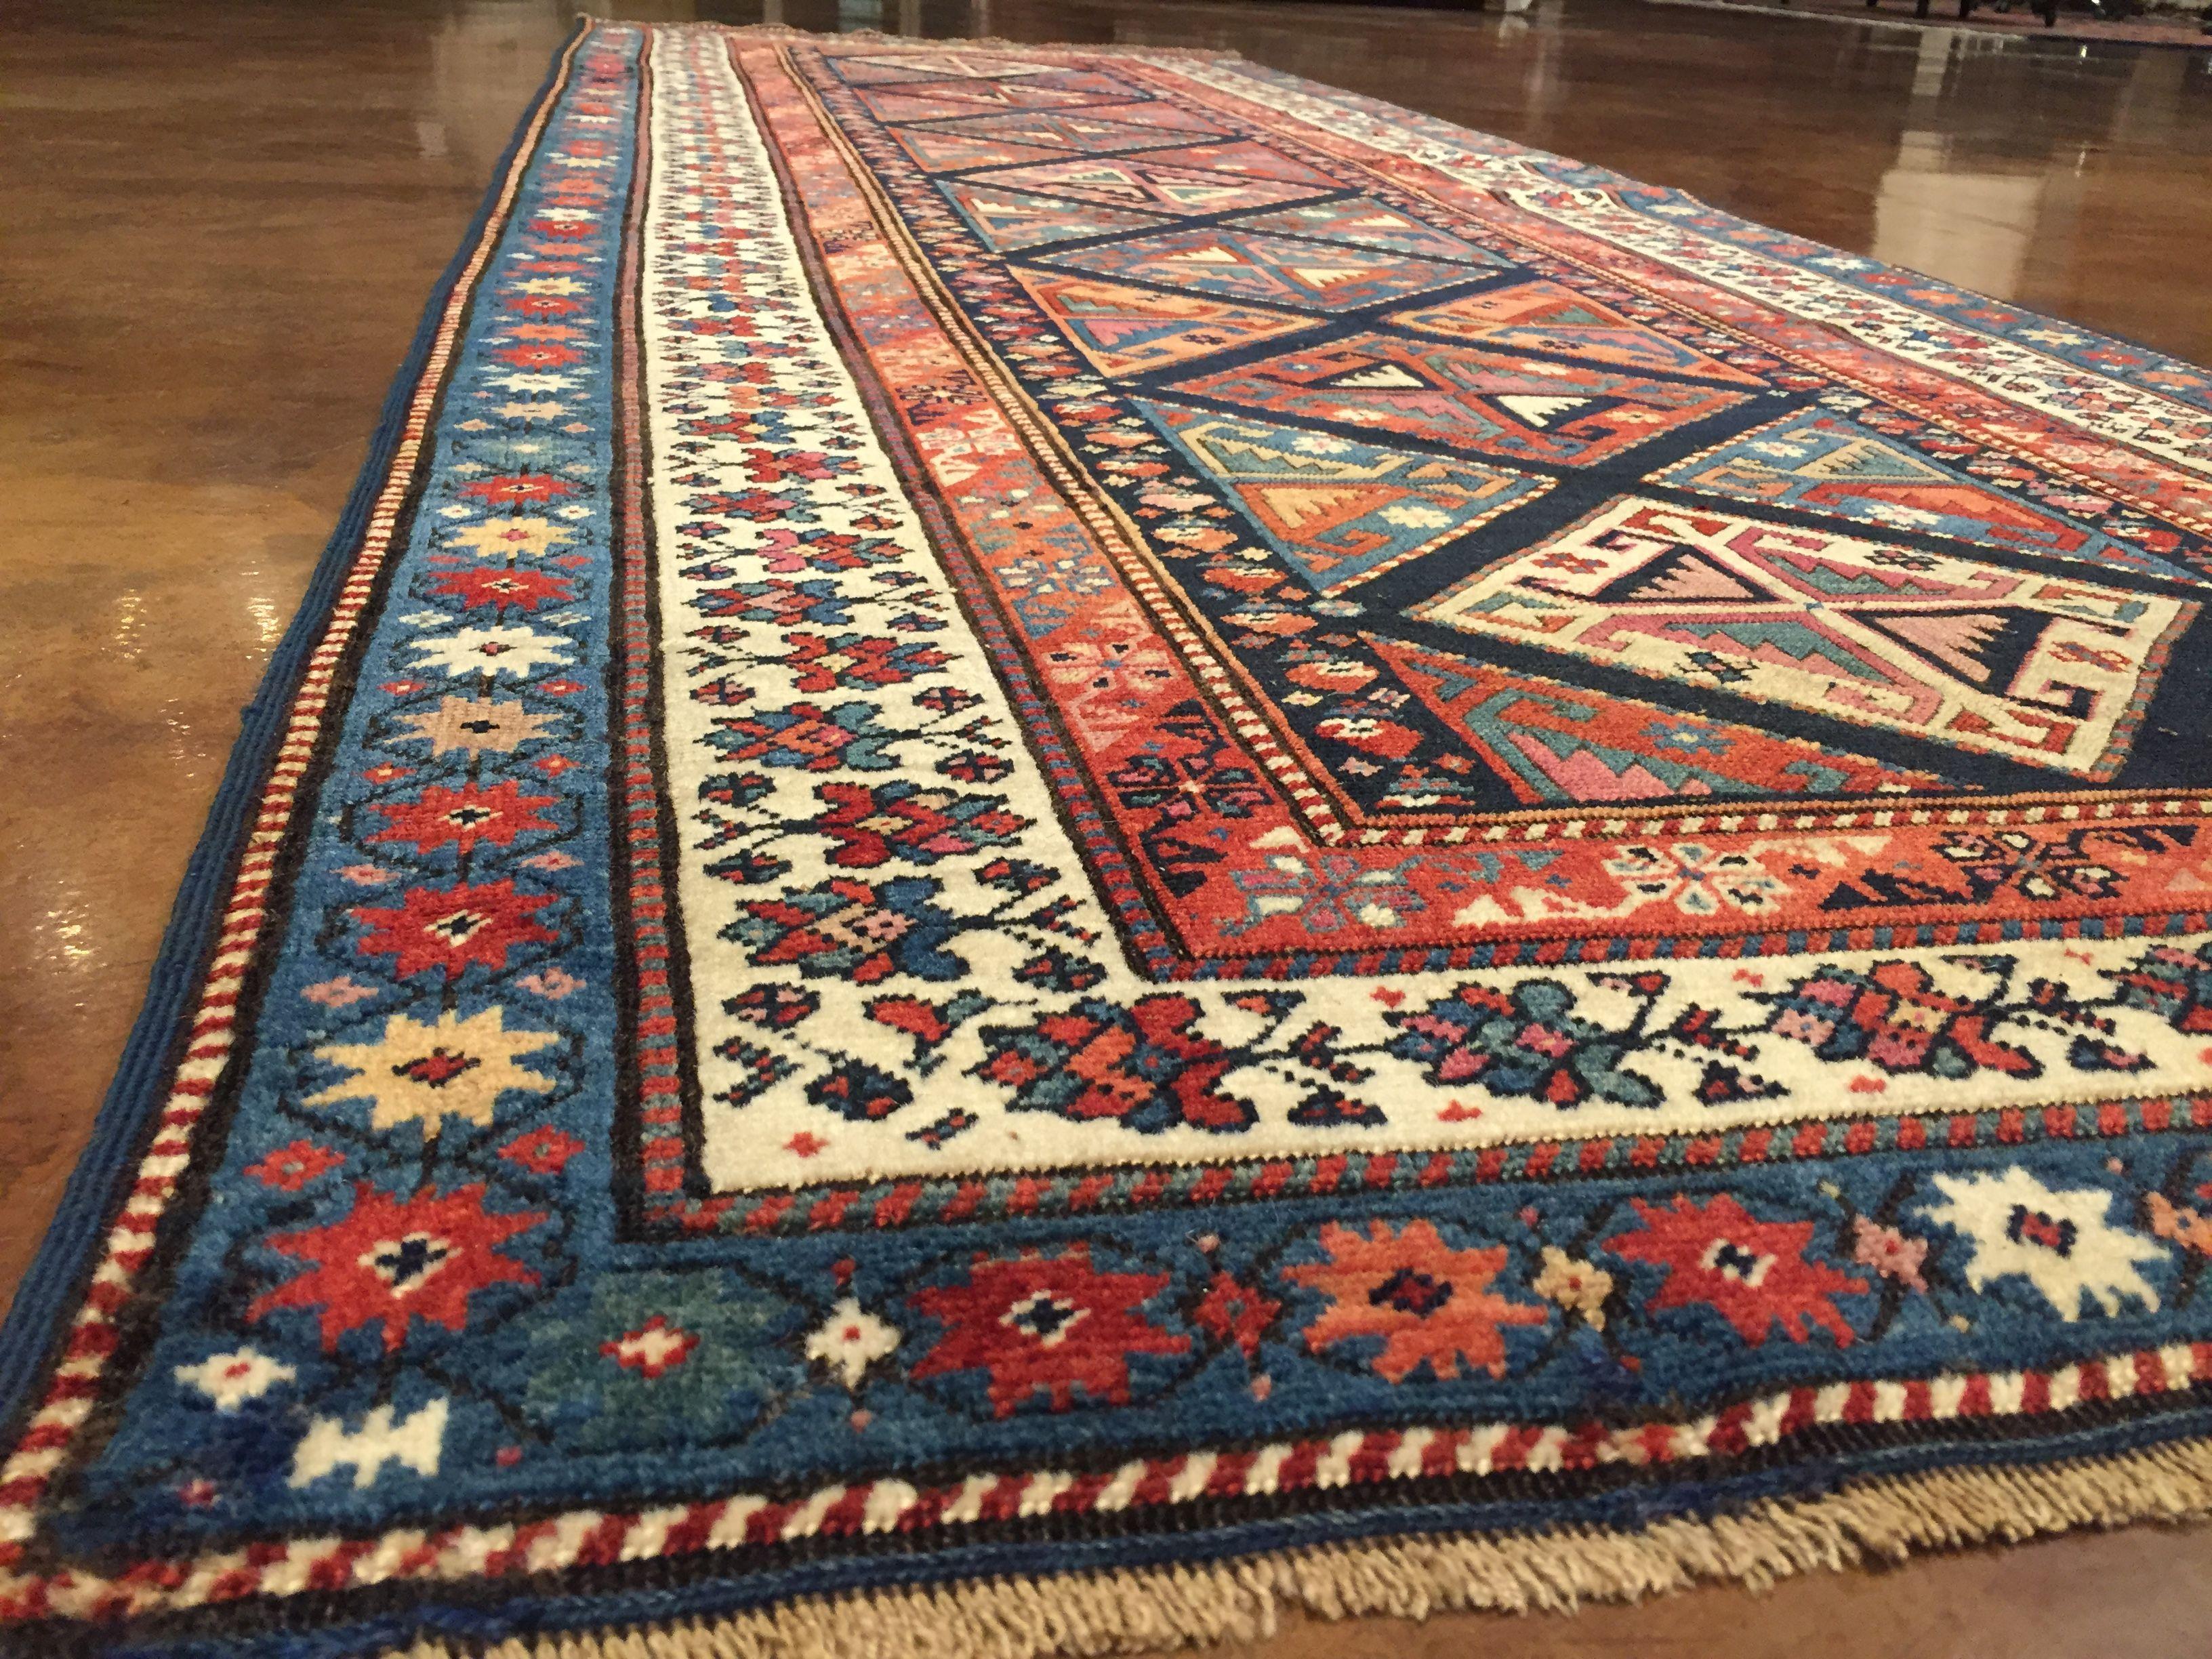 Caucasus Circa 1880 Antique Oriental Rug Runners Rugs Oriental Rug Cleaning Rugs On Carpet